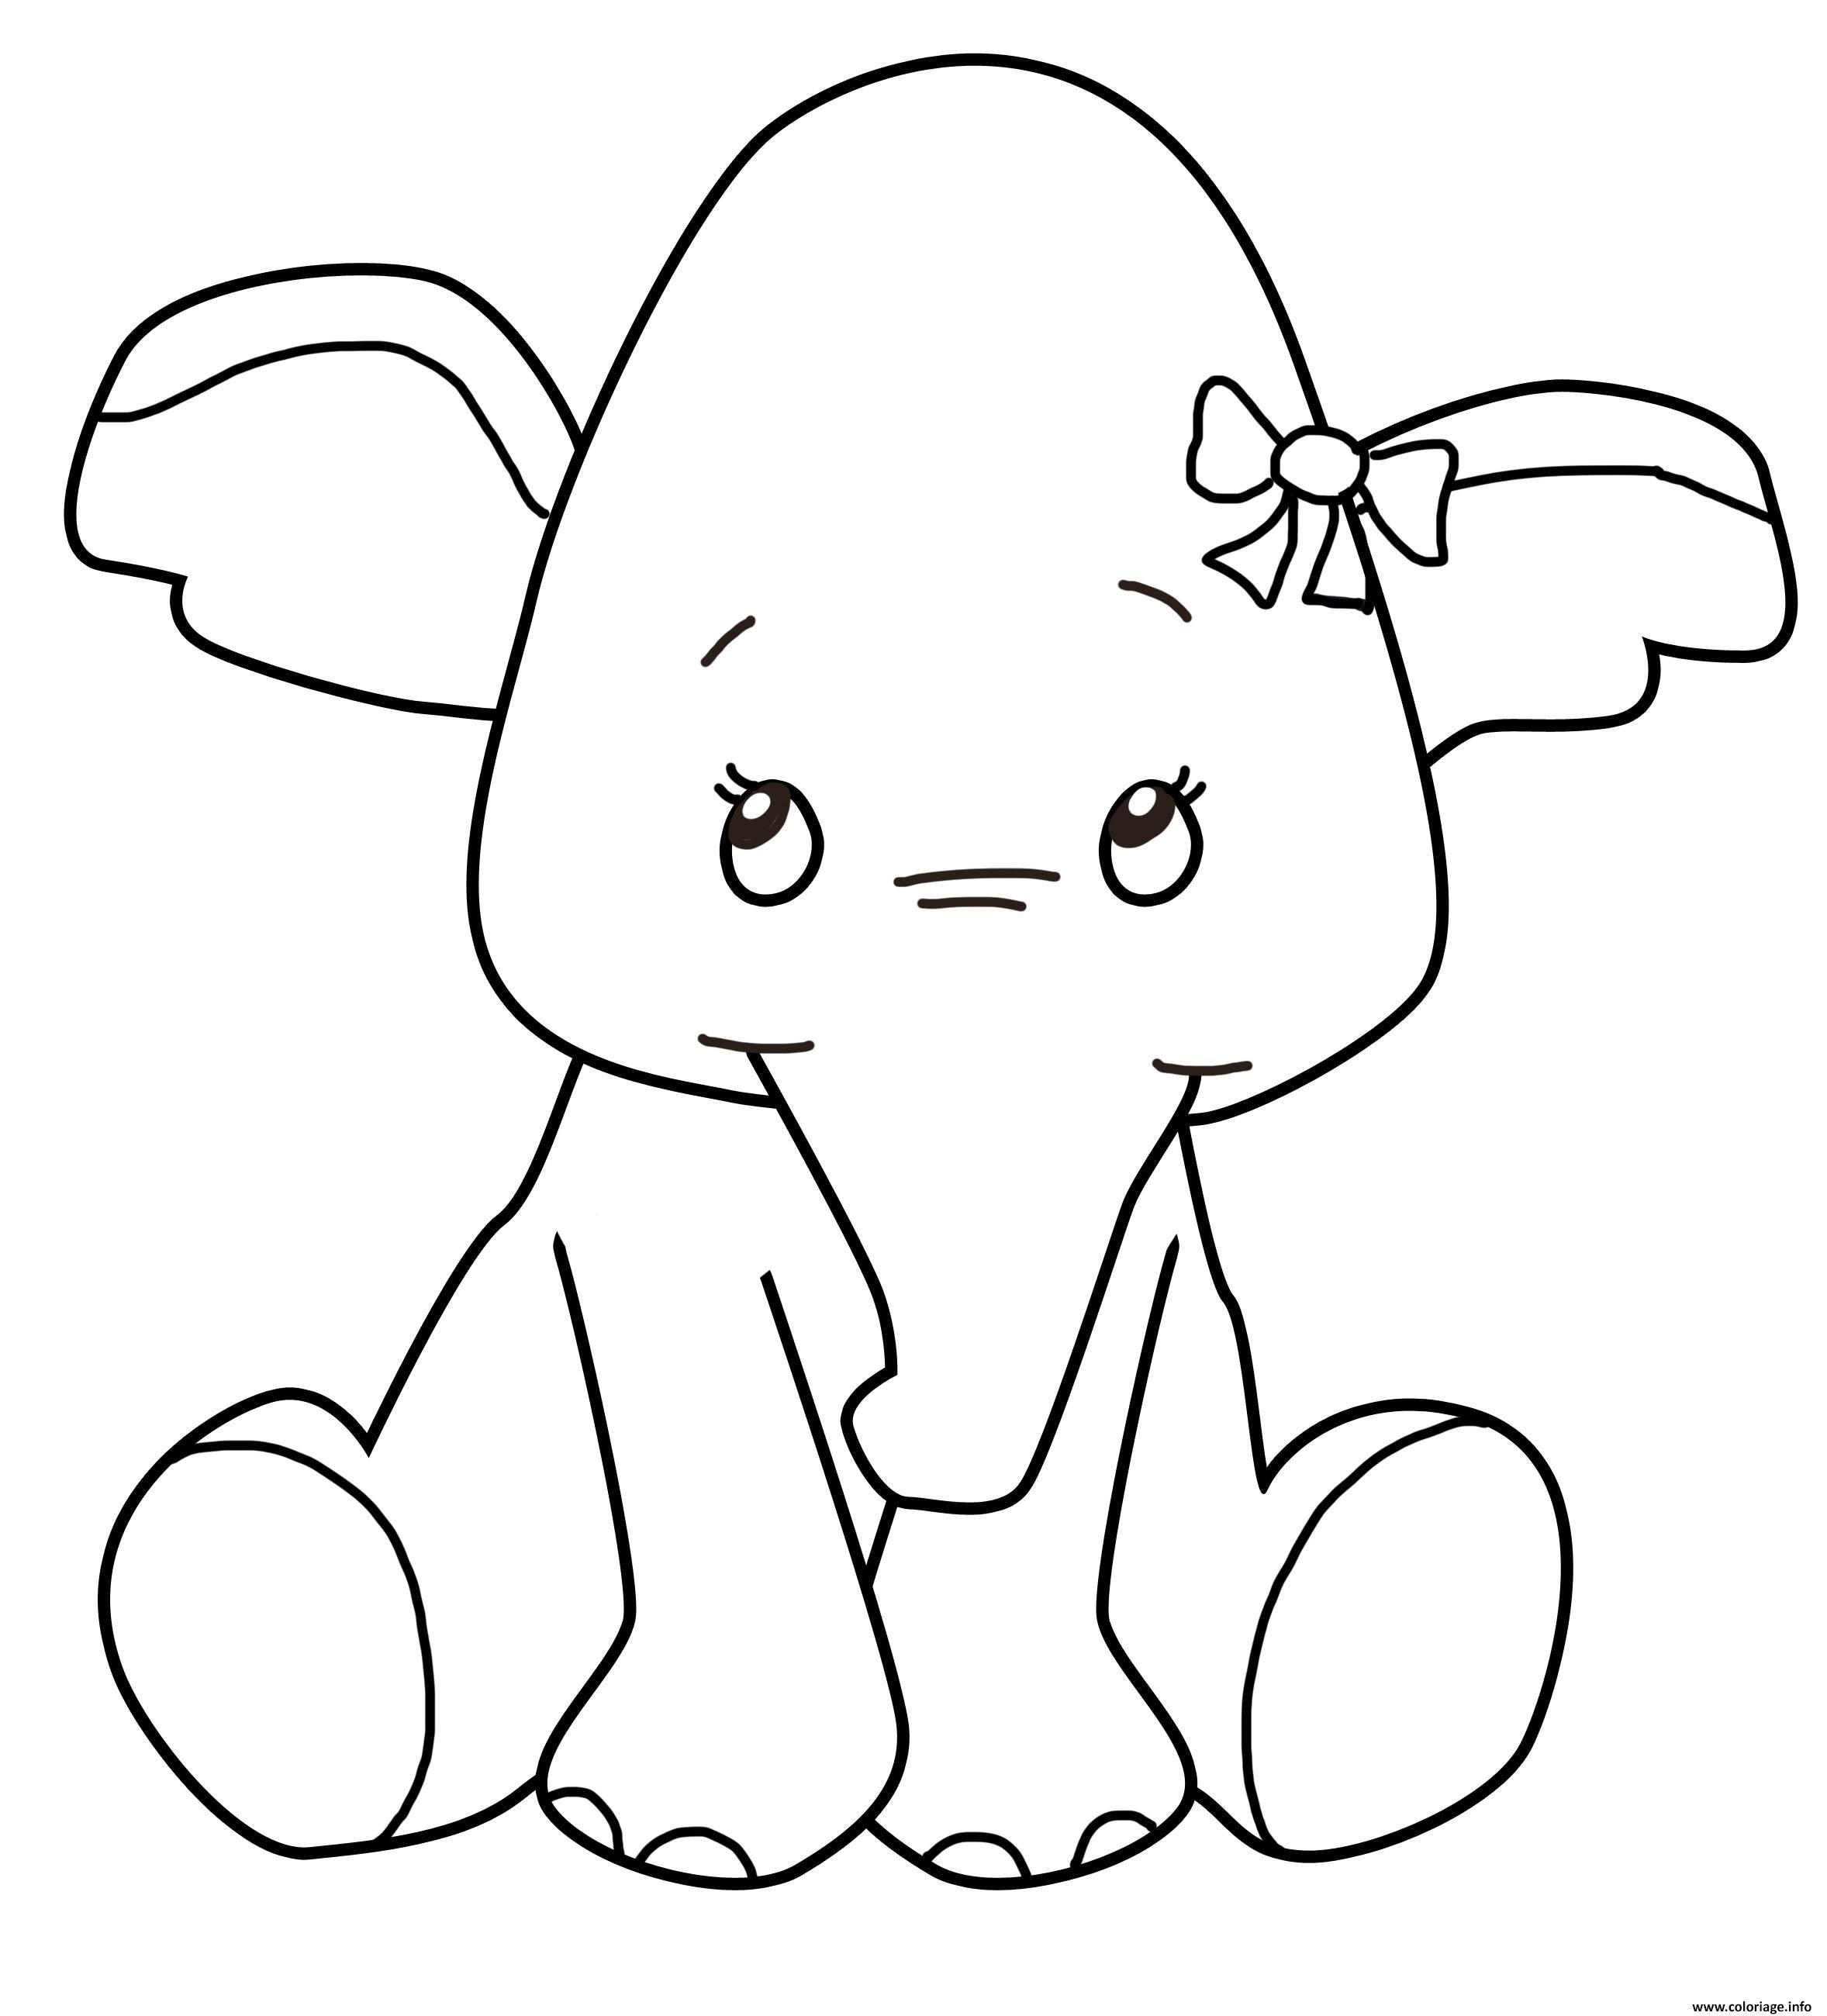 Coloriage bebe elephant animaux enfants dessin - Dessin enfant a imprimer ...